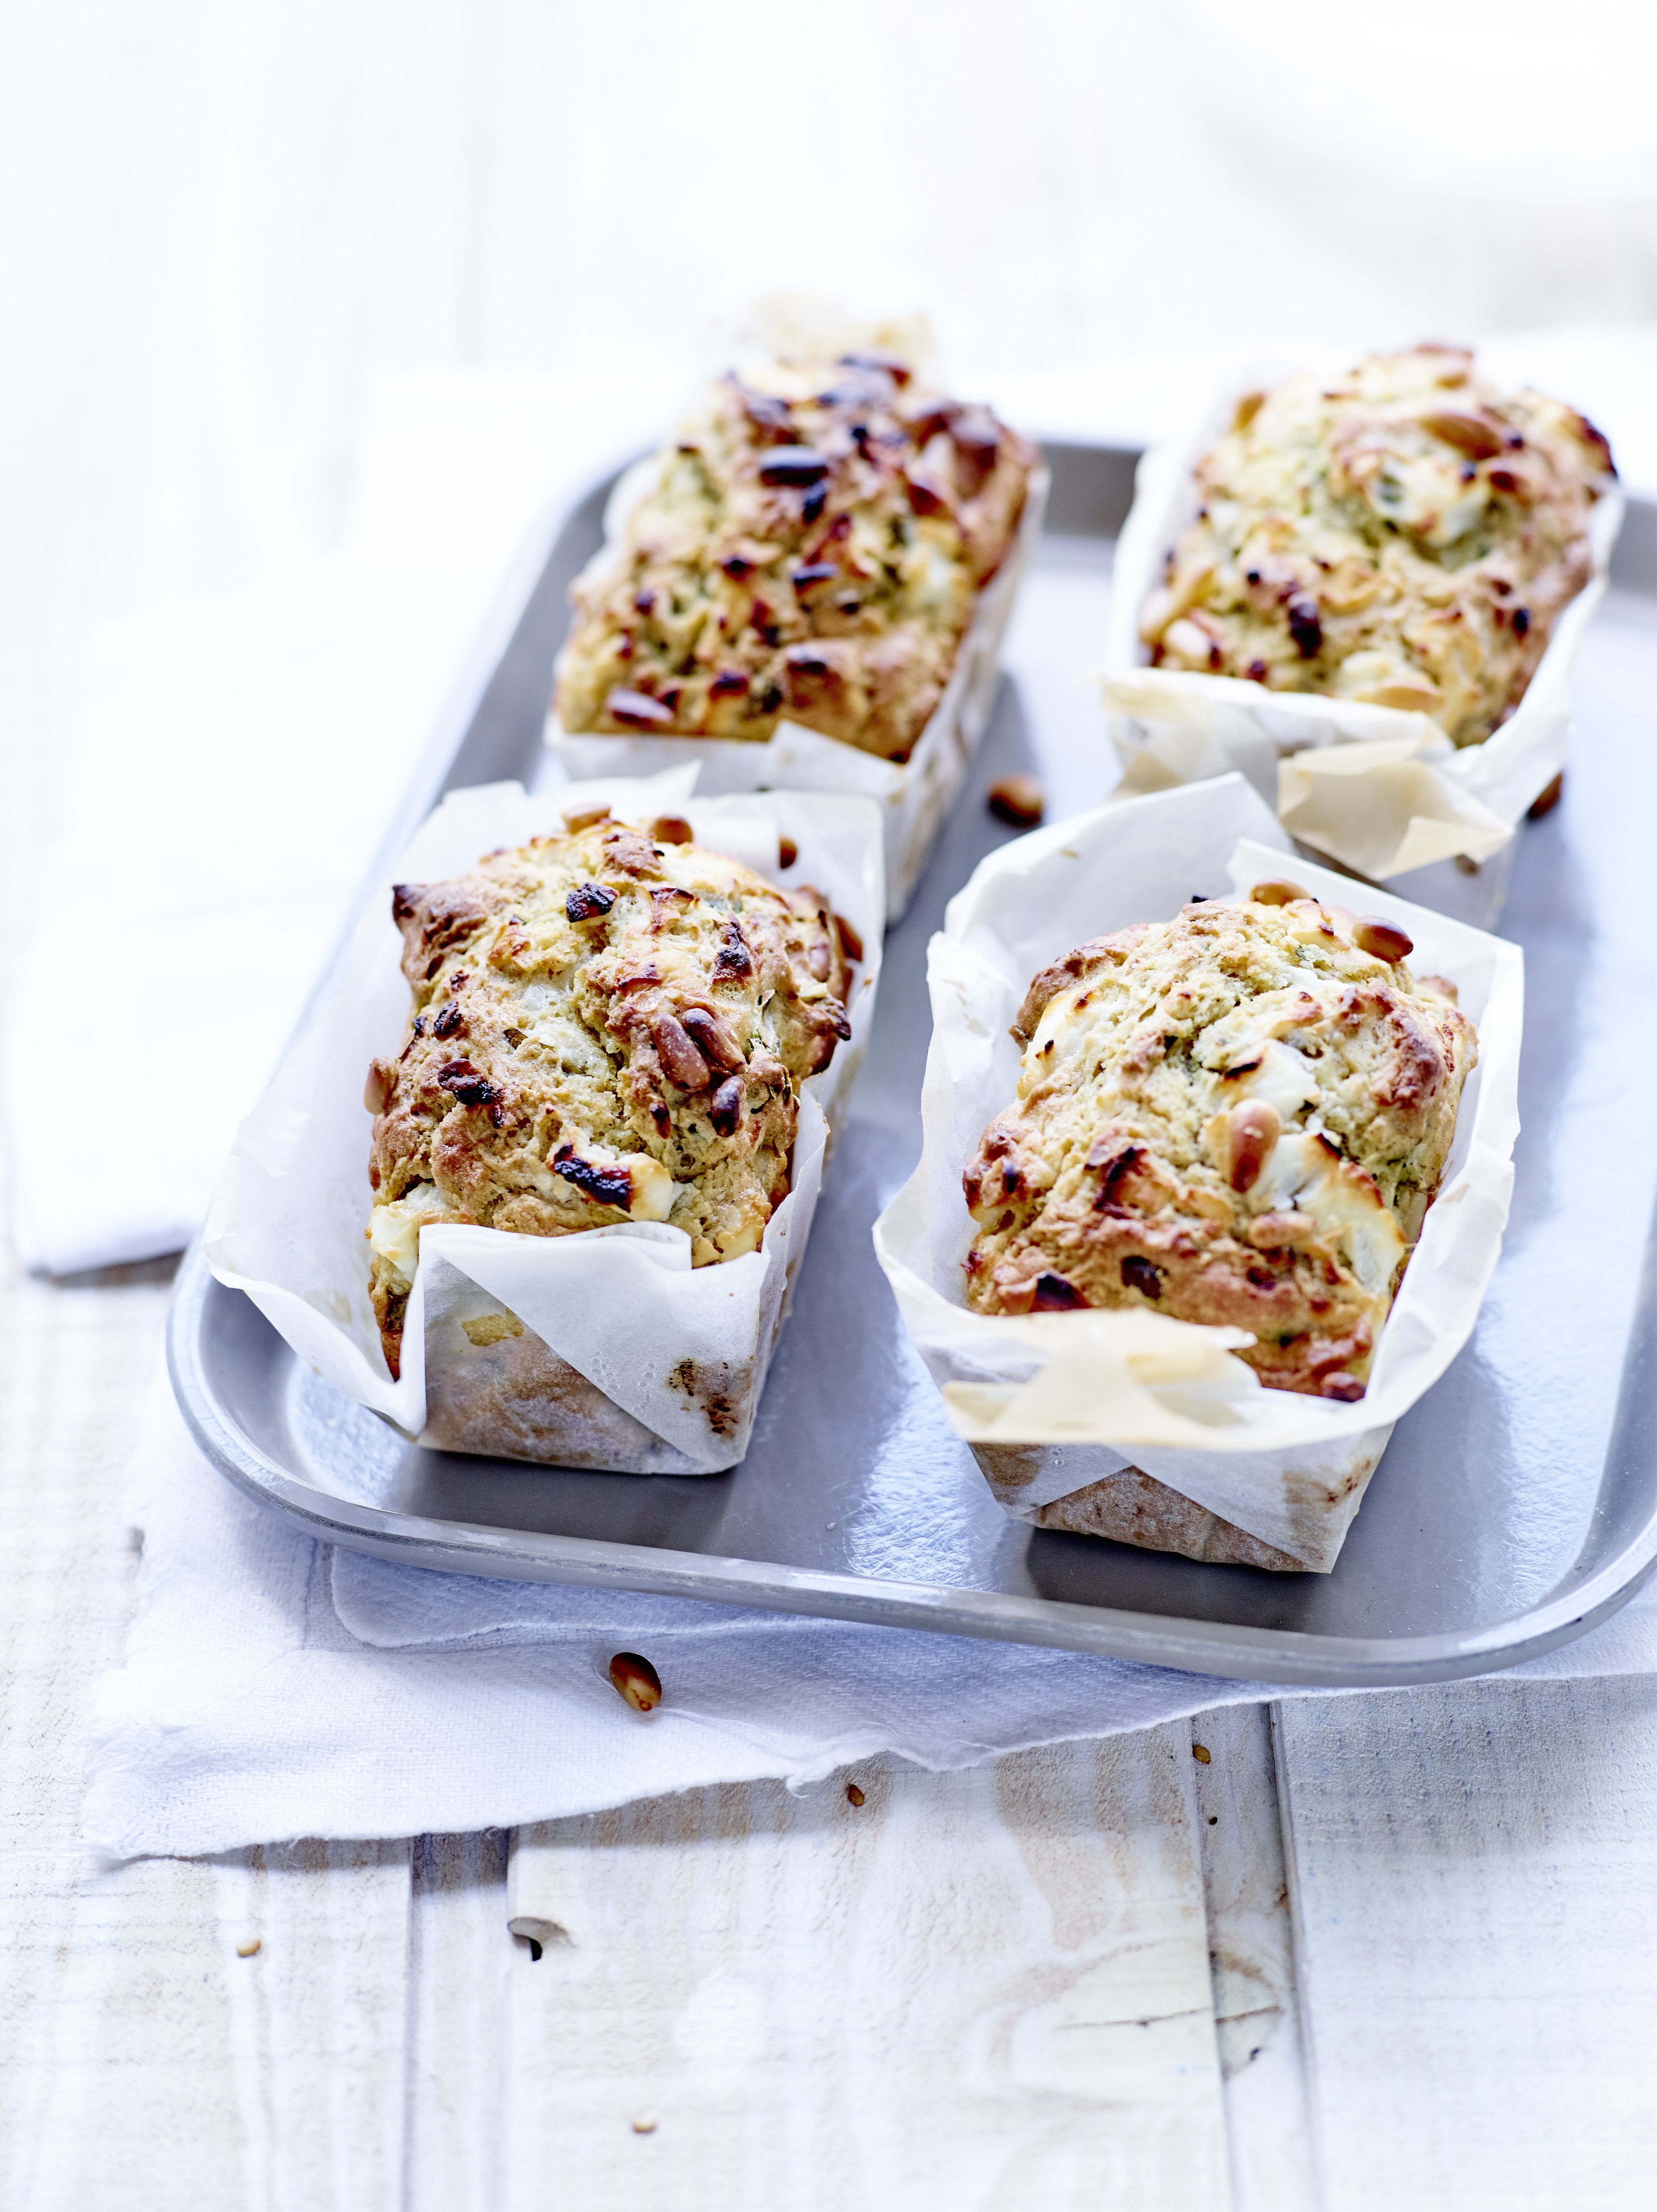 cake vegan recette recettes saines cake vegan cake. Black Bedroom Furniture Sets. Home Design Ideas